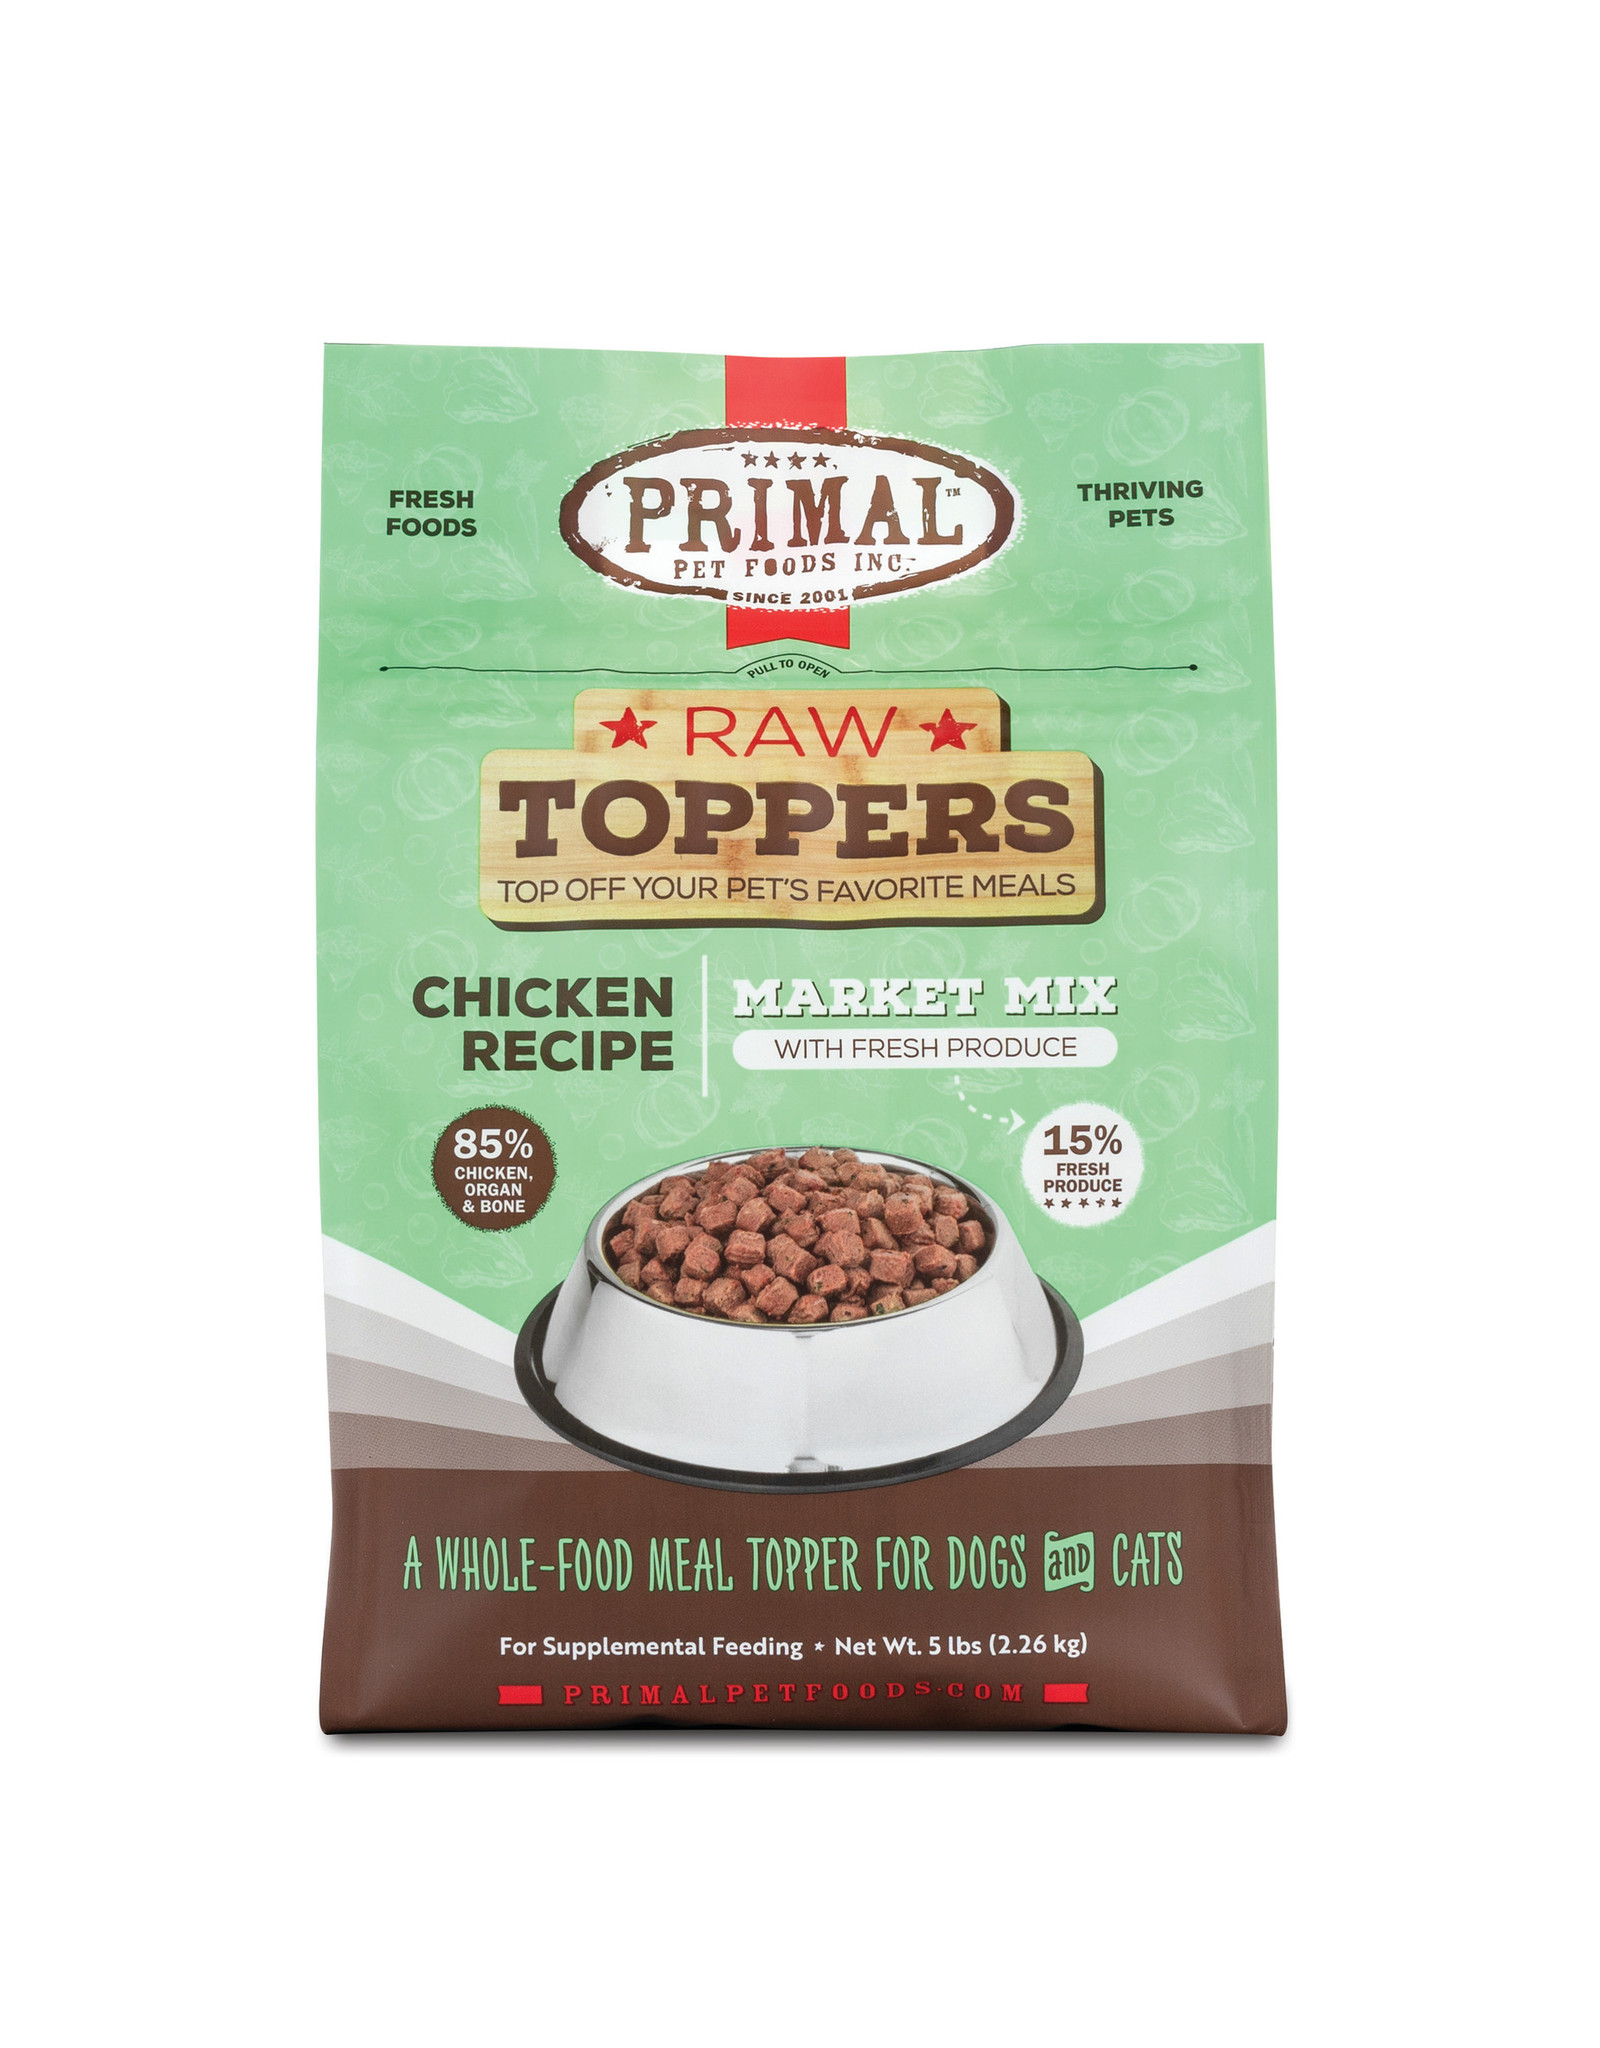 Primal Primal Raw Toppers Market Mix Chicken